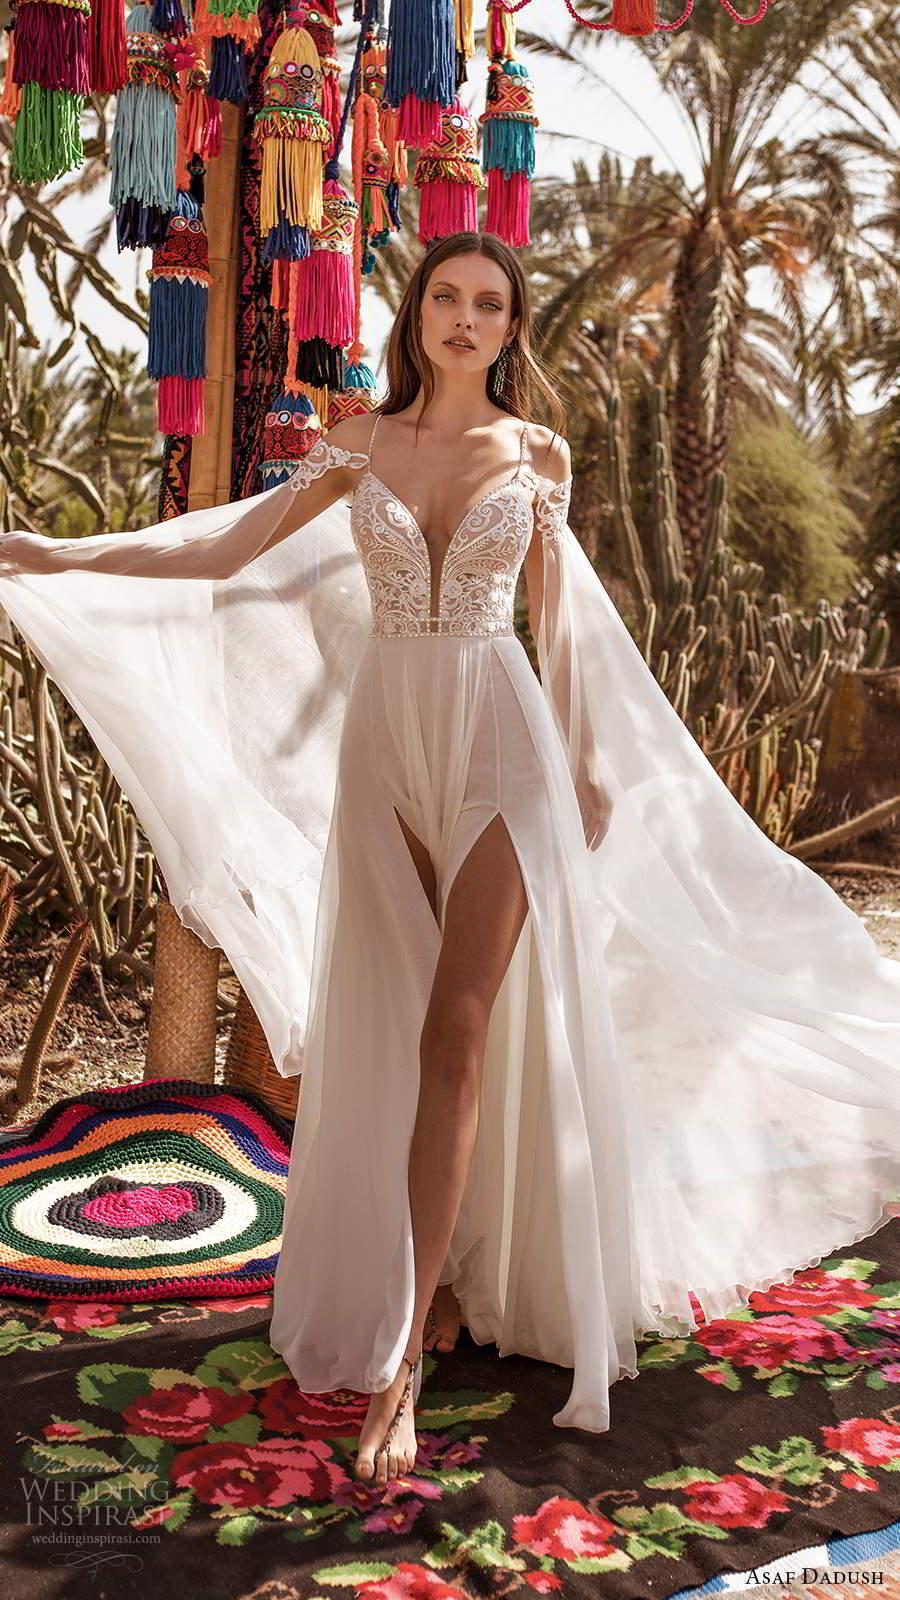 asaf dadush 2020 bridal sleeveless thin straps plunging v neckline heavily embellished bodice clean skirt a line wedding dress chapel train cape (1) fv